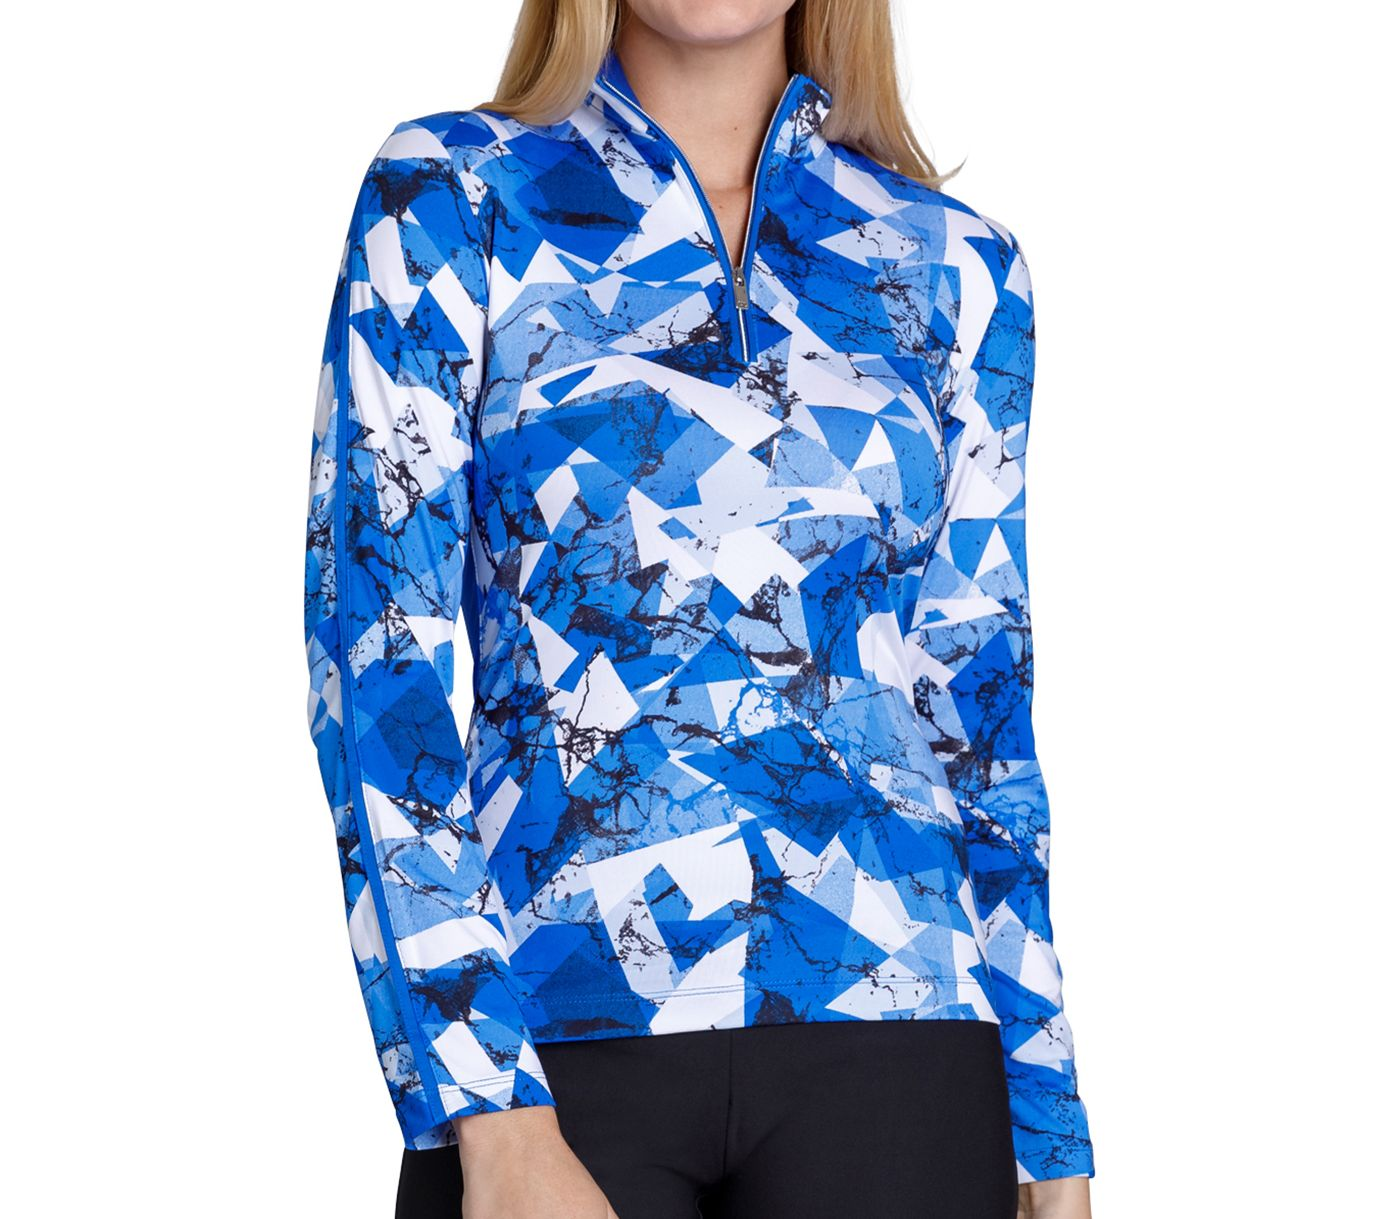 Tail Women's Printed Pattern Golf 1/4 Zip